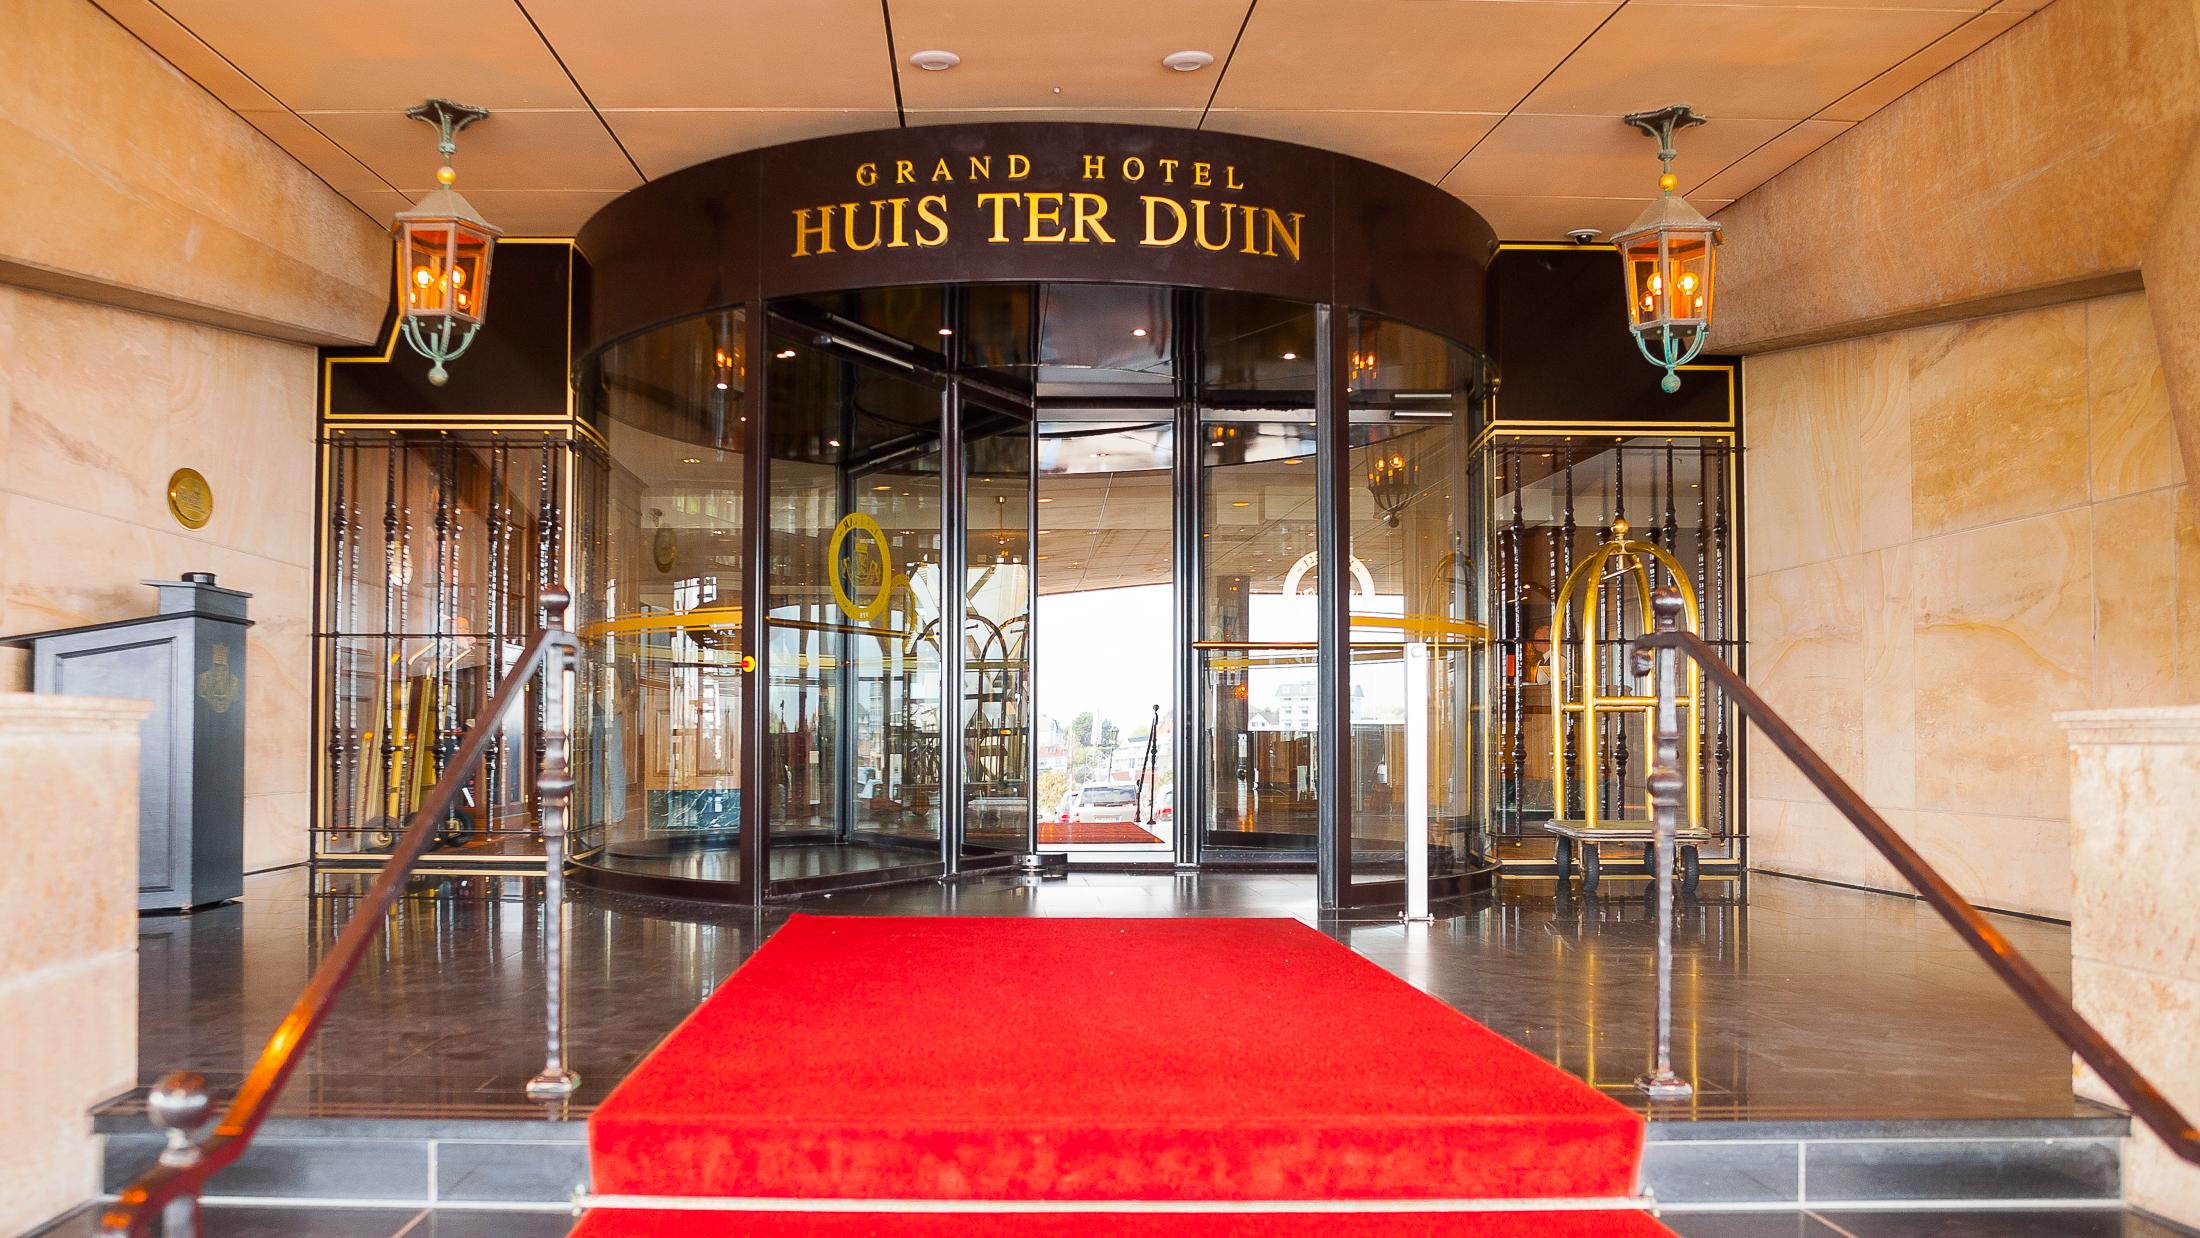 Grand Hotel Huis Ter Duin Bauporte De